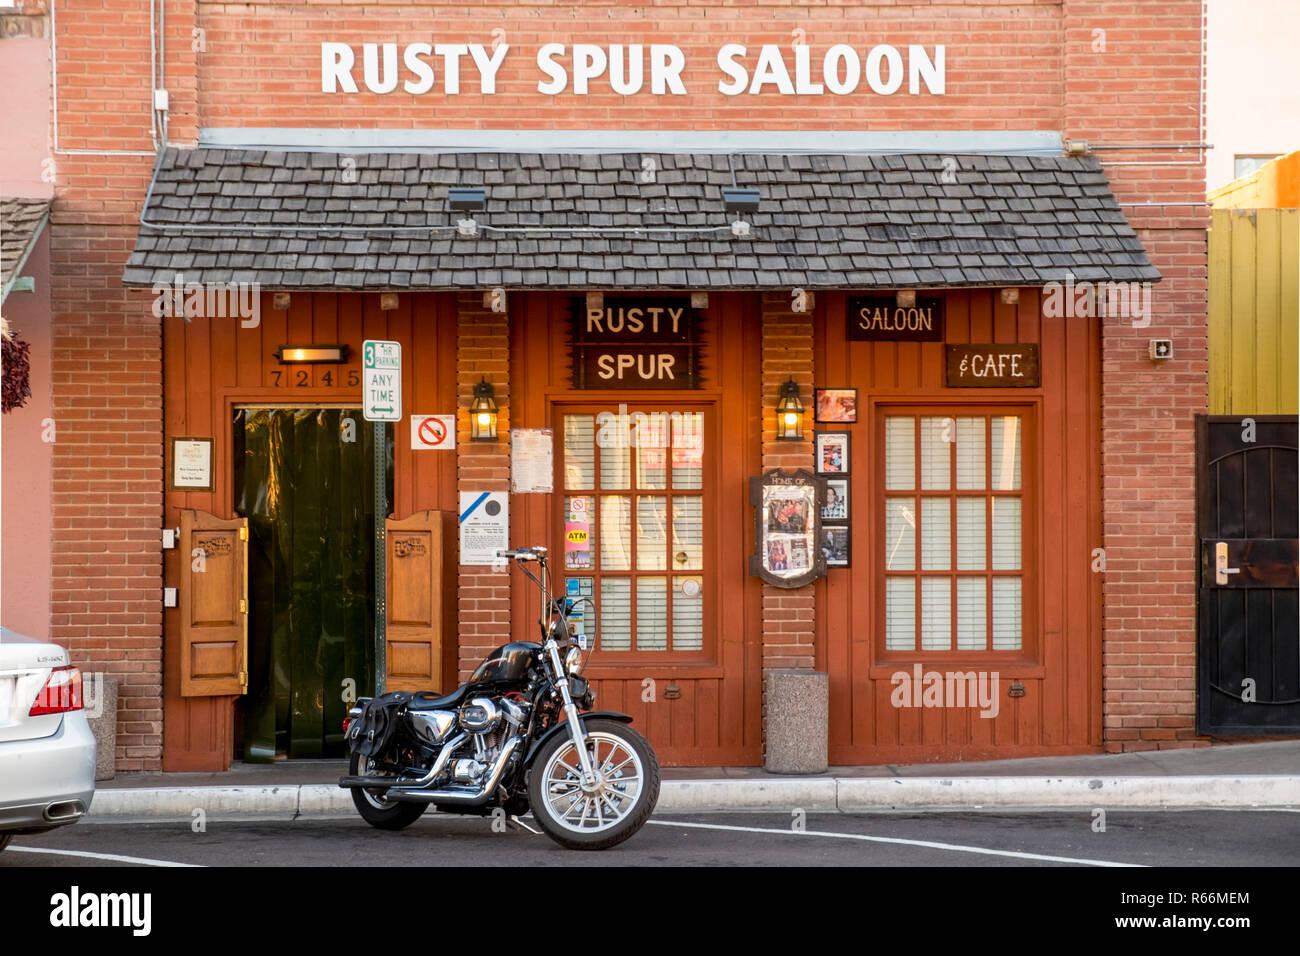 Rusty Spur Saloon, Old Town Scottsdale, Scottsdale, Phoenix, Arizona, USA - Stock Image